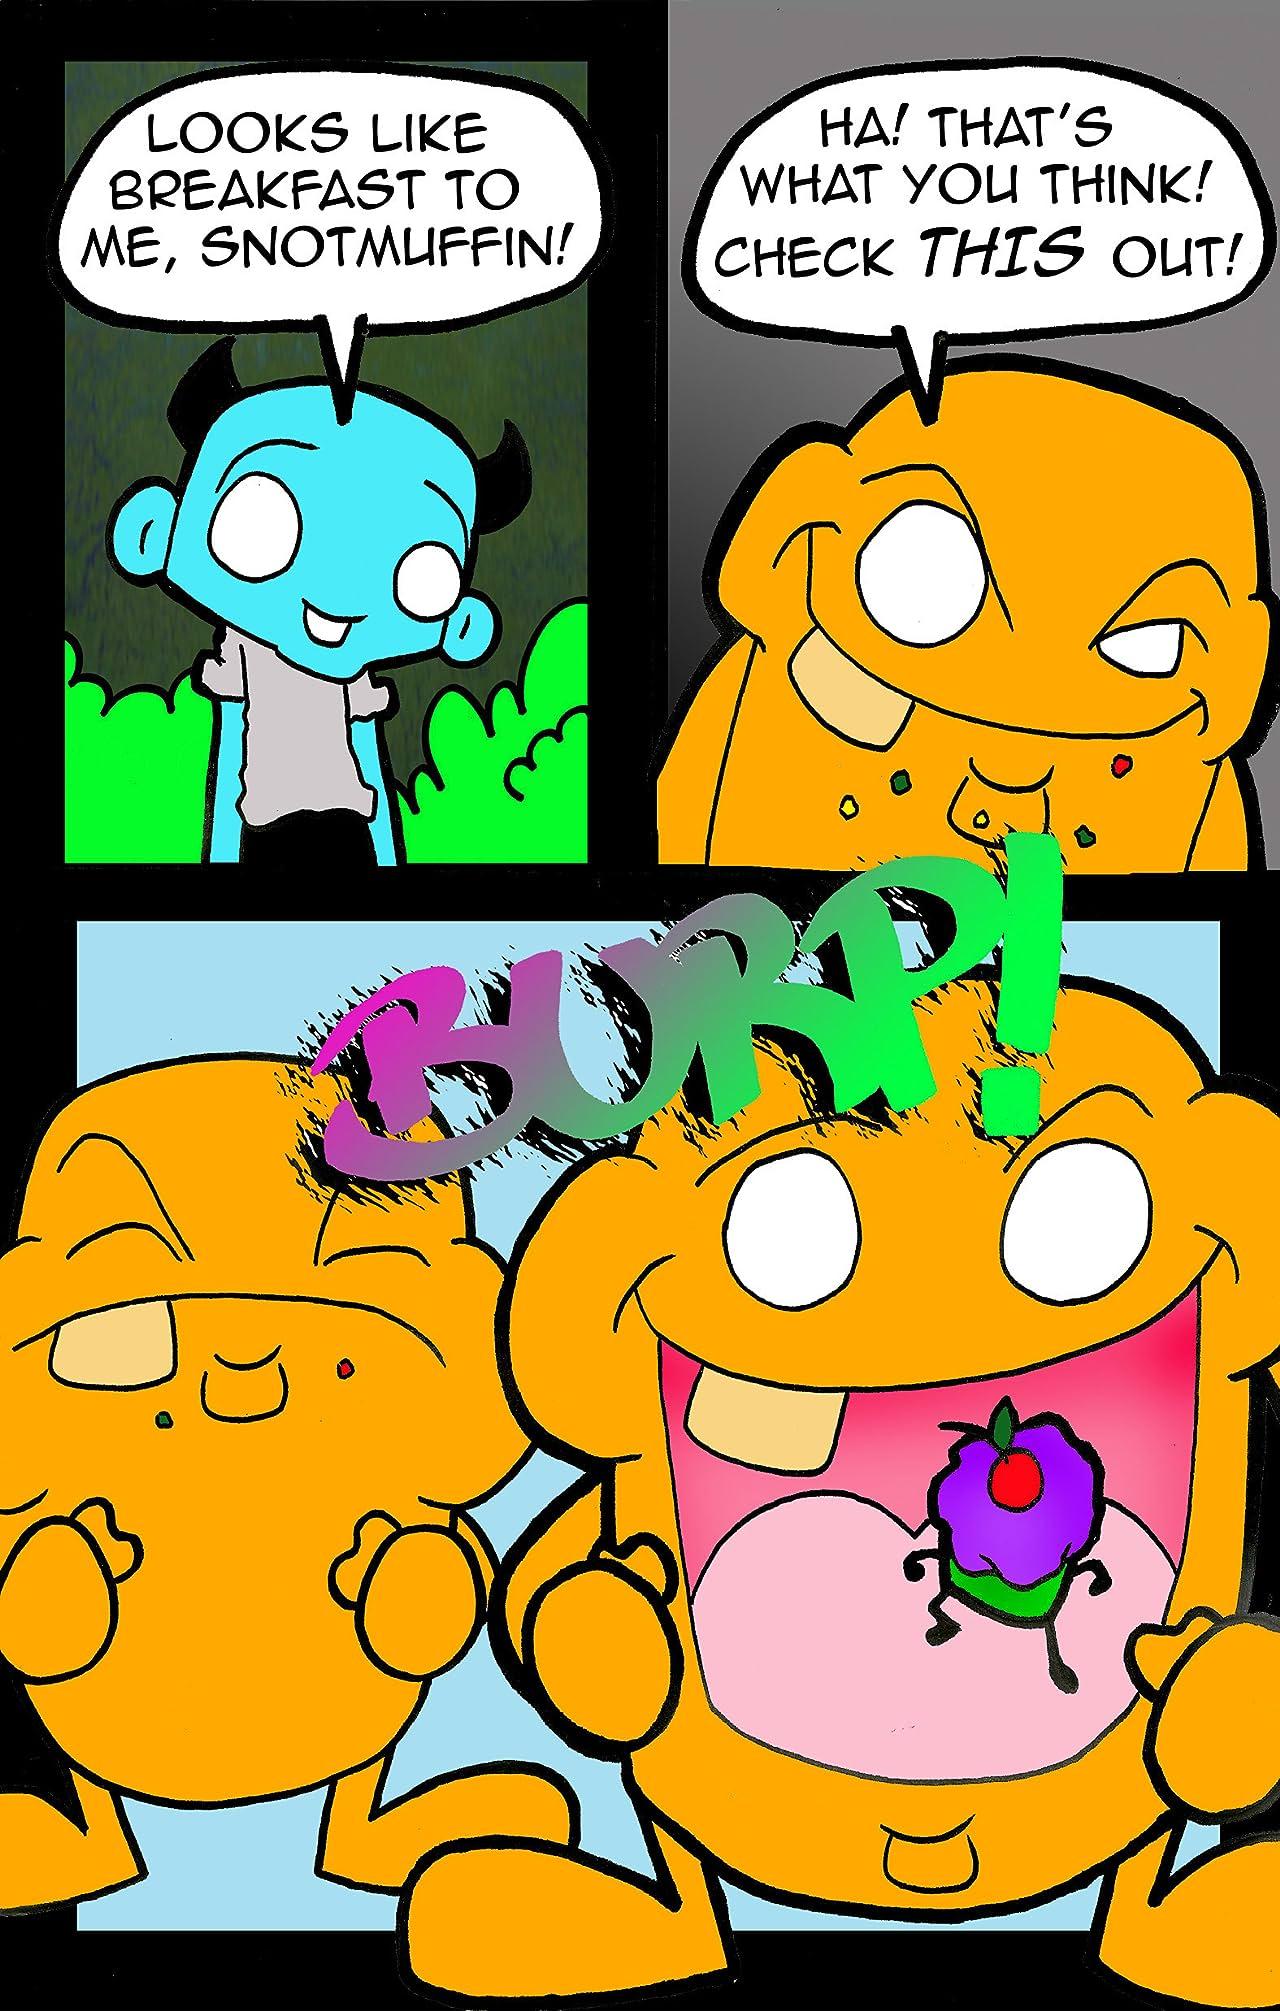 ZippyCakes and SnotMuffin #2